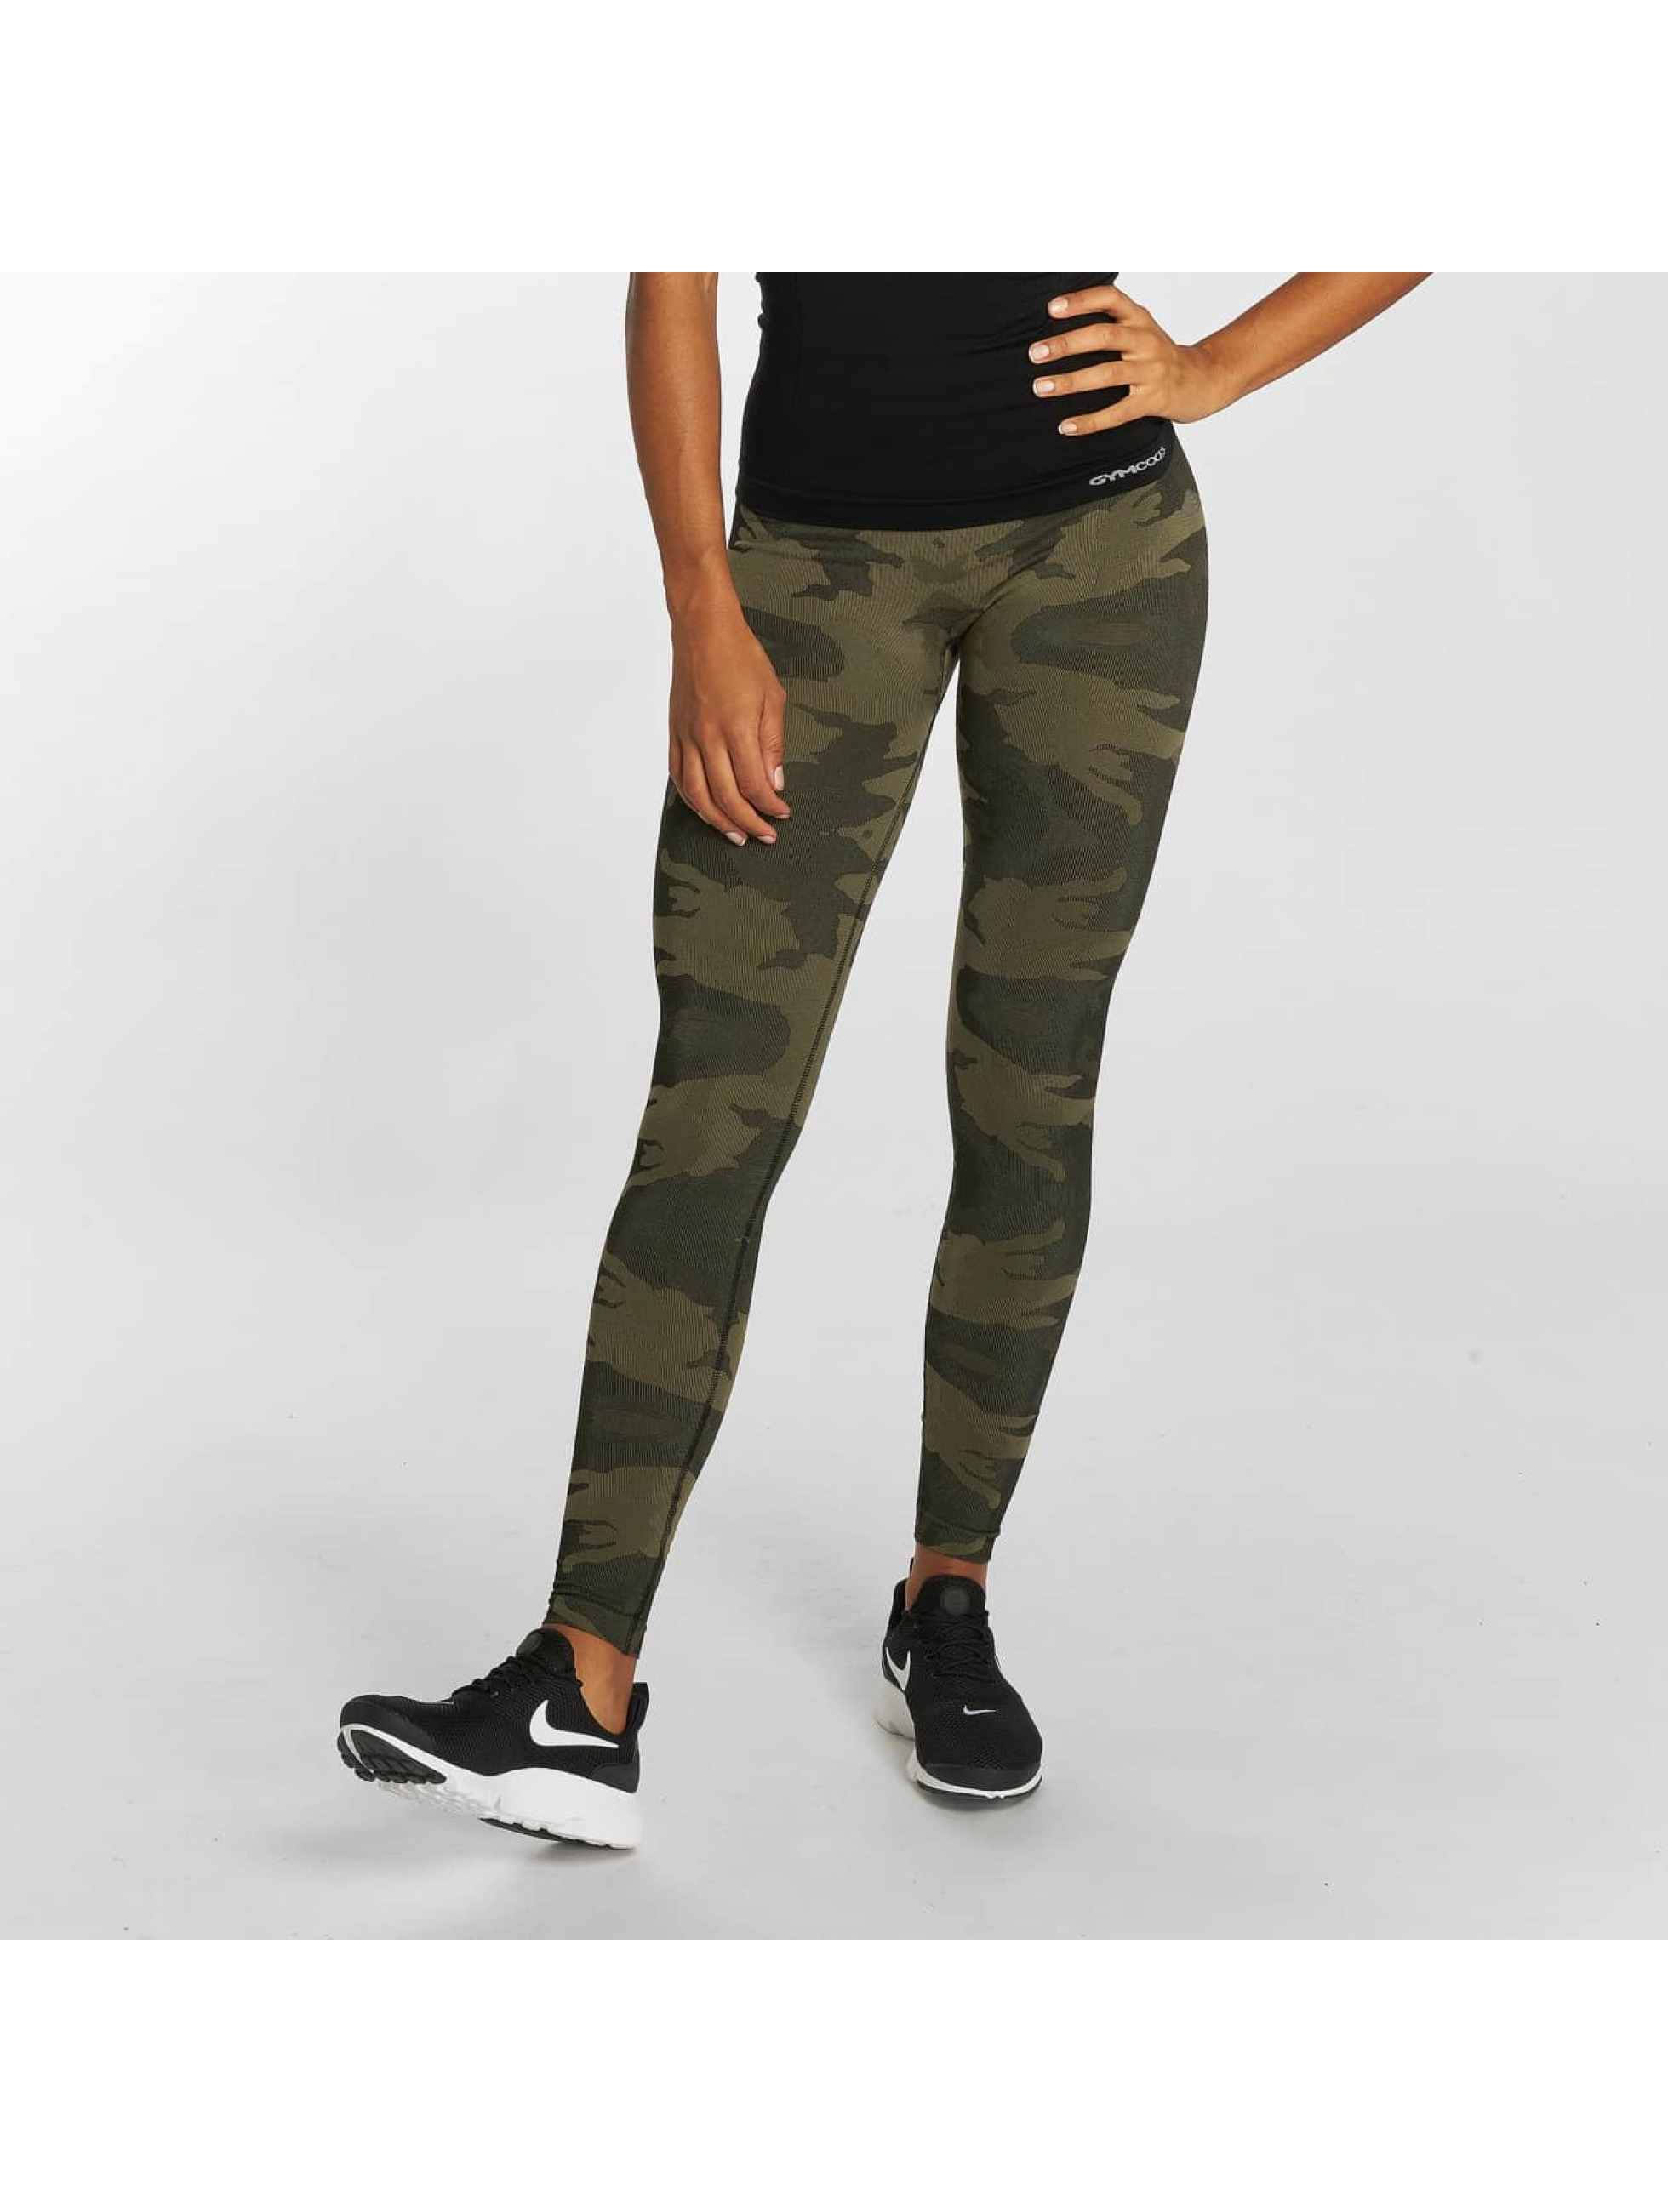 GymCodes Leggingsit/Treggingsit Flex High-Waist camouflage